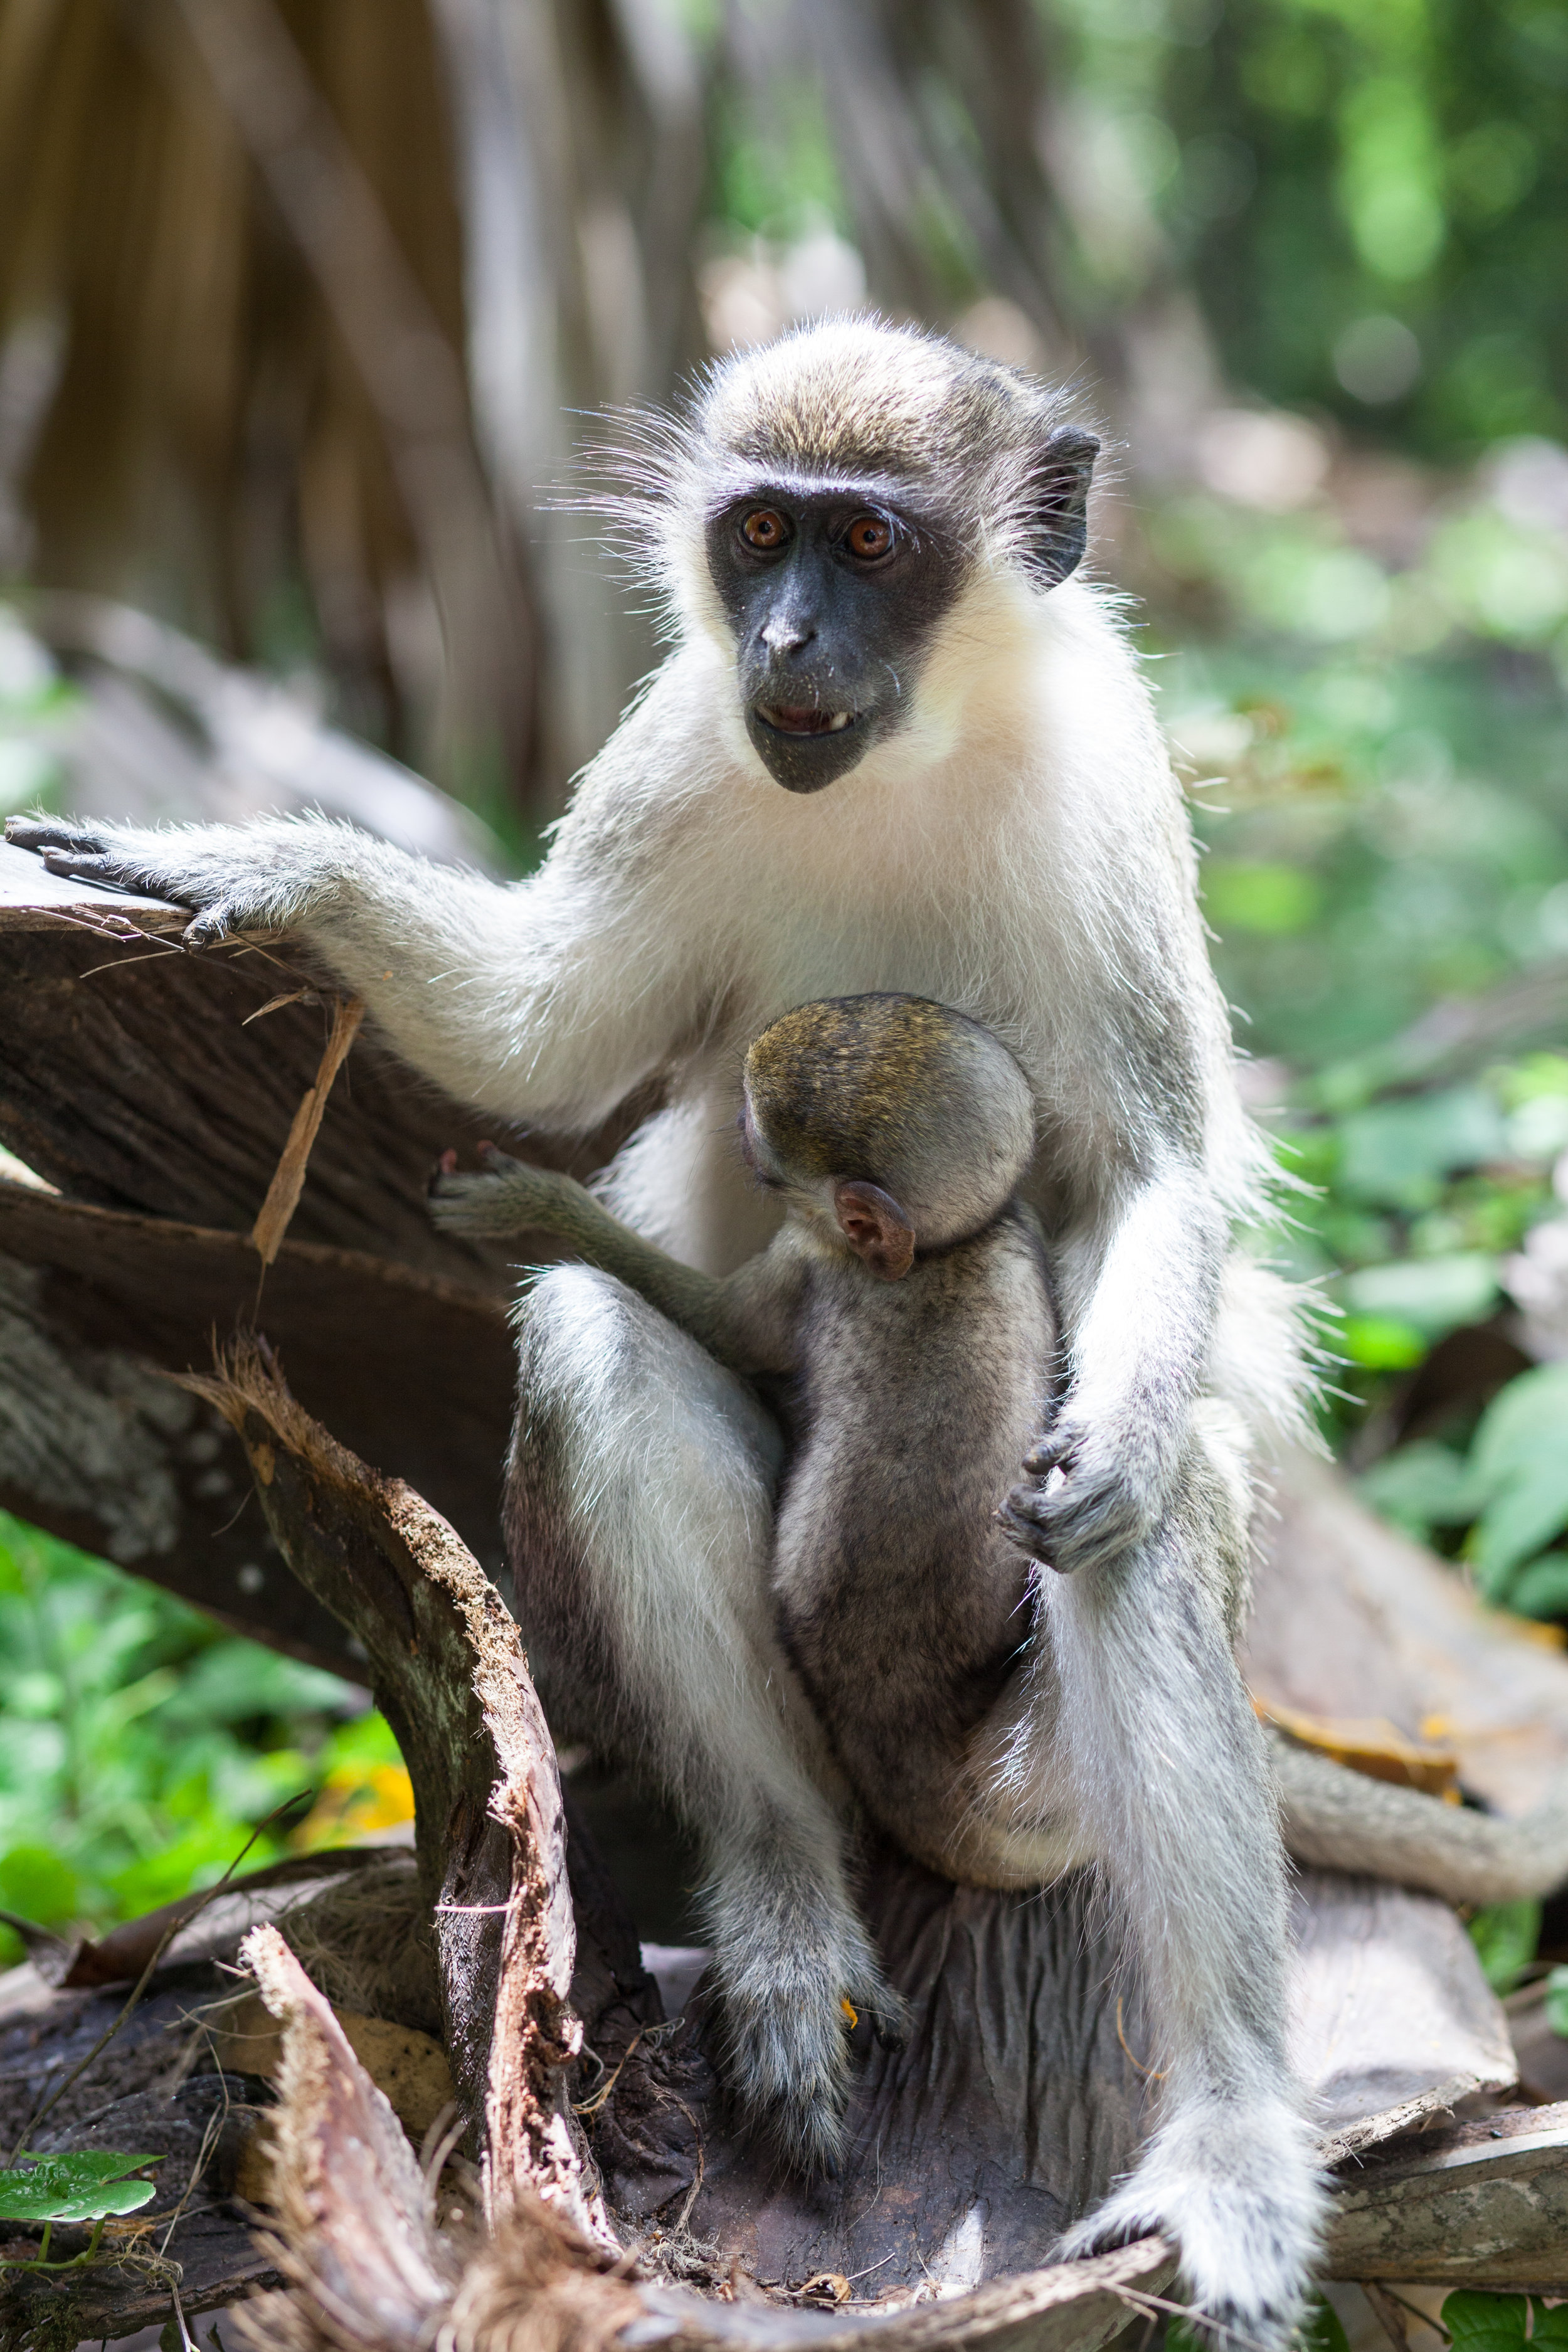 Monkey_Forest_23.jpg